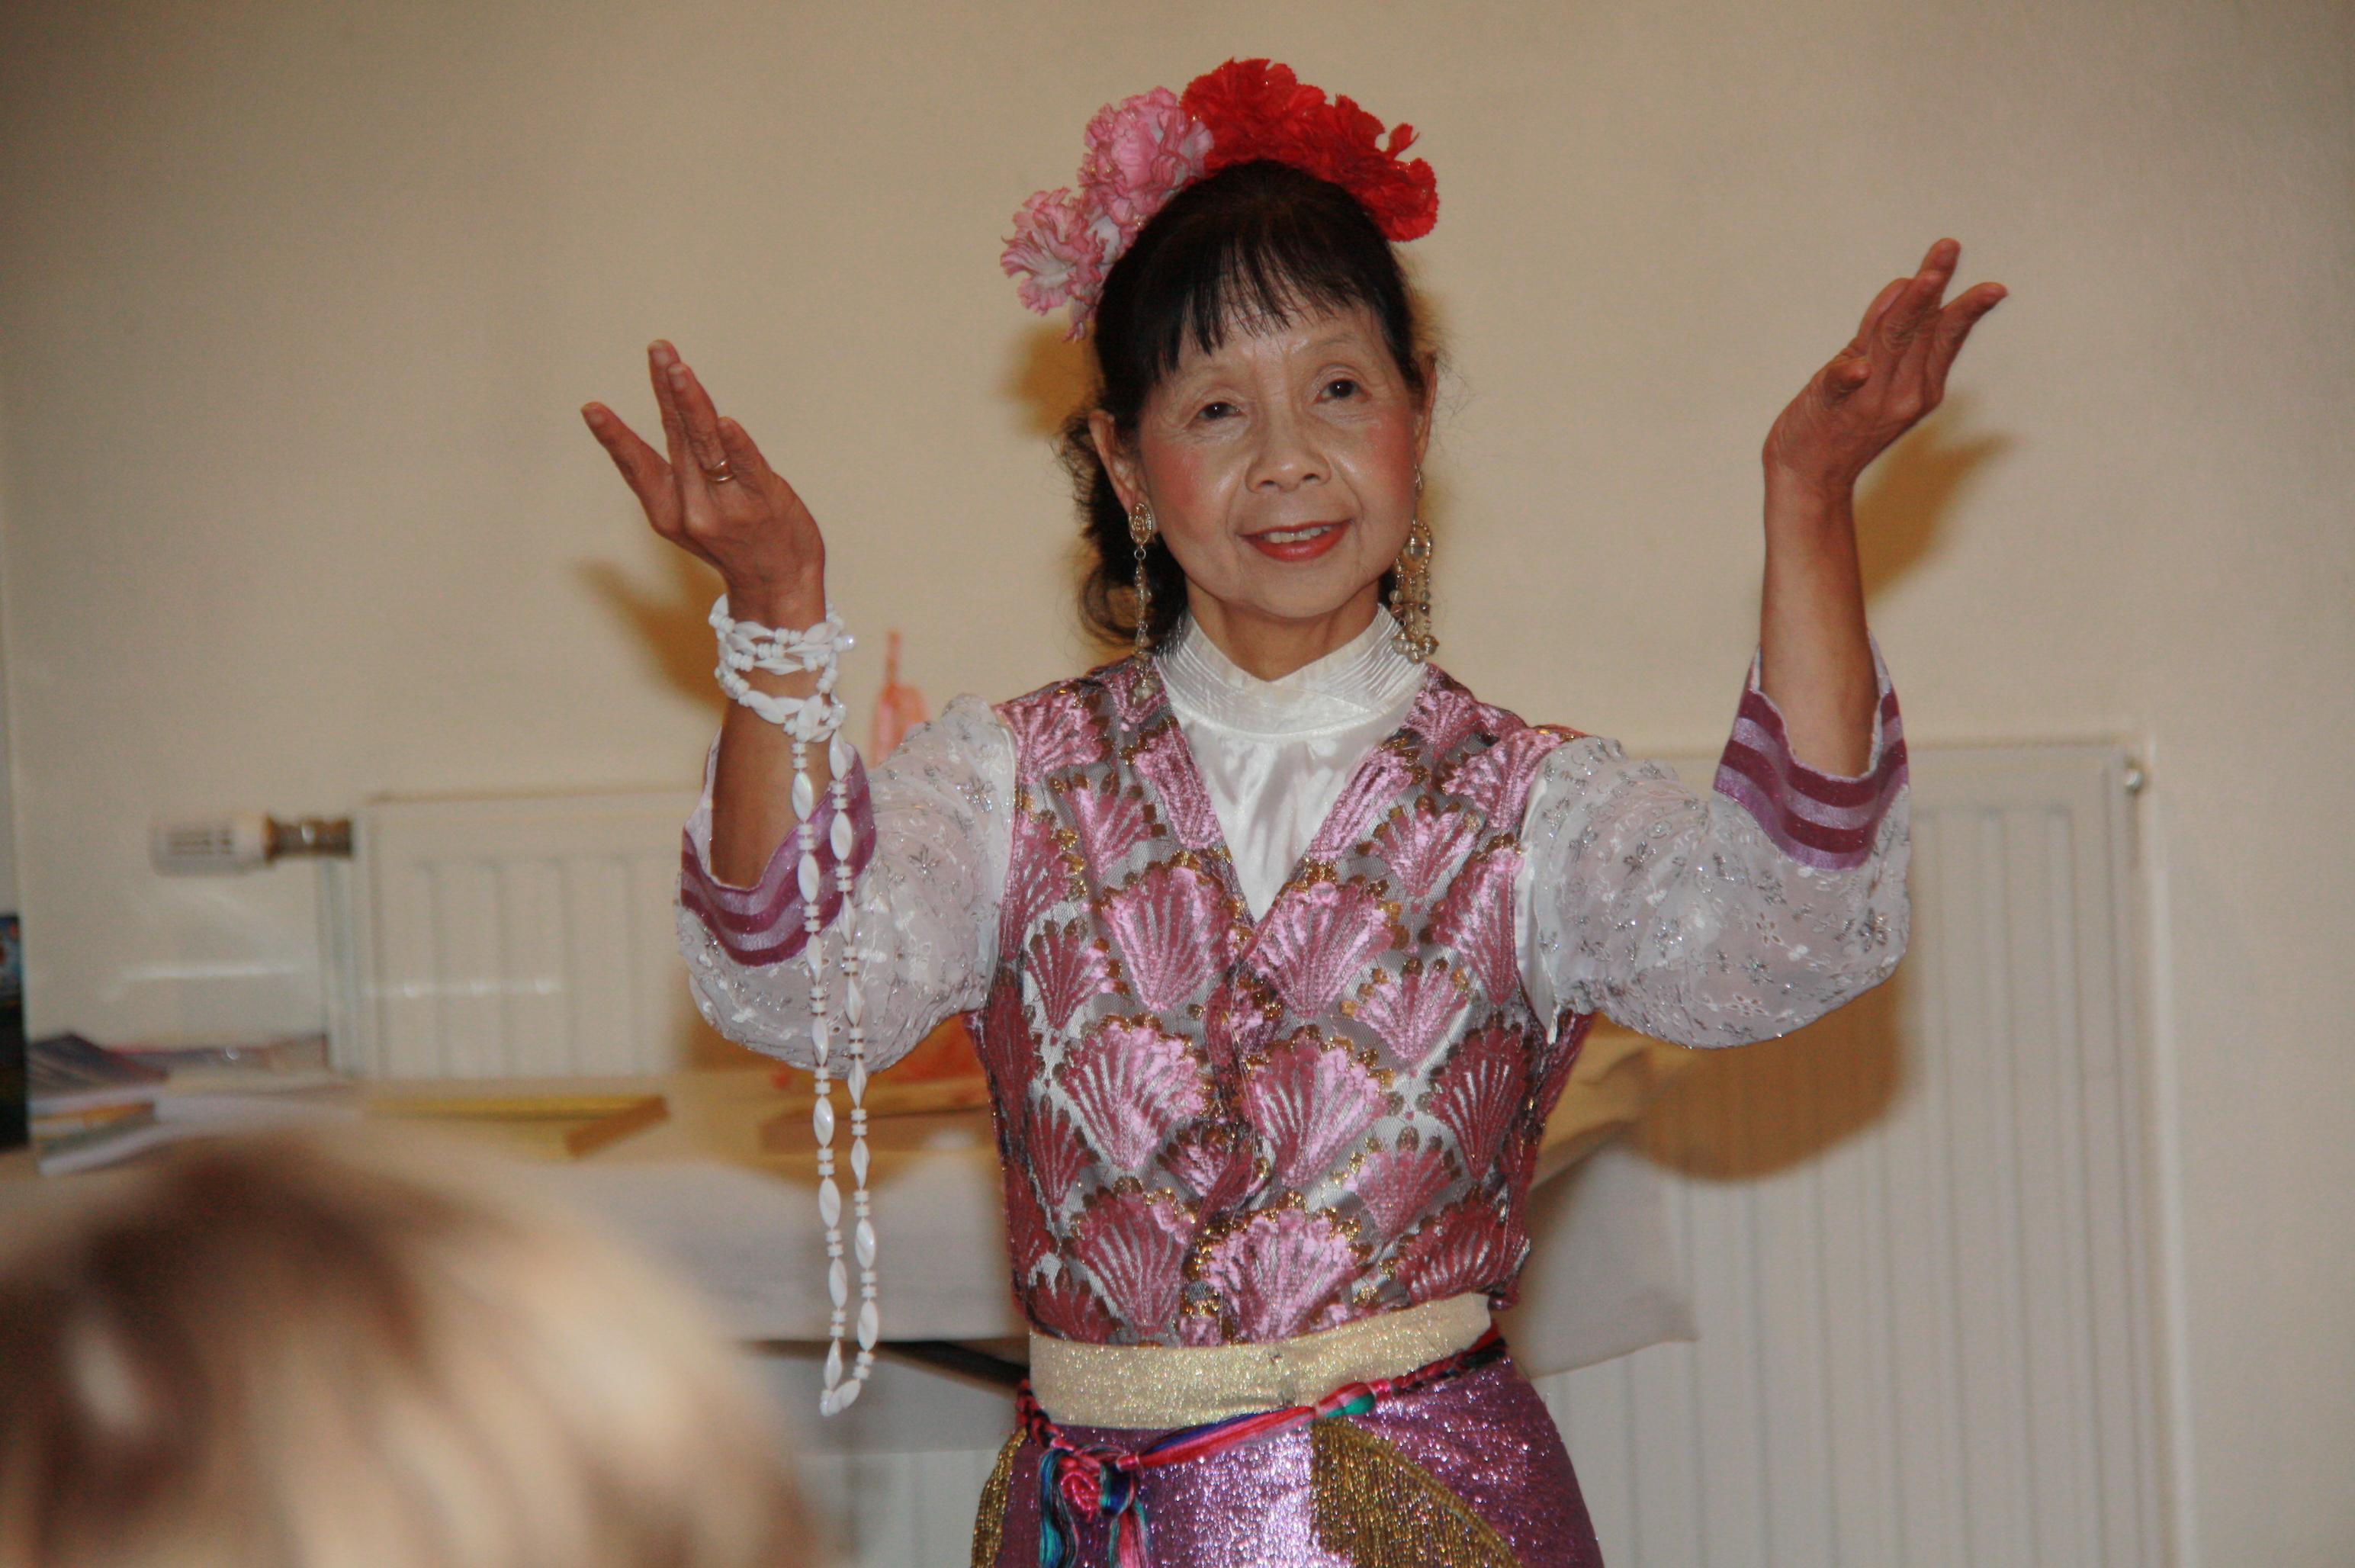 Madame Maicuc Moine, danseuse professionnelle